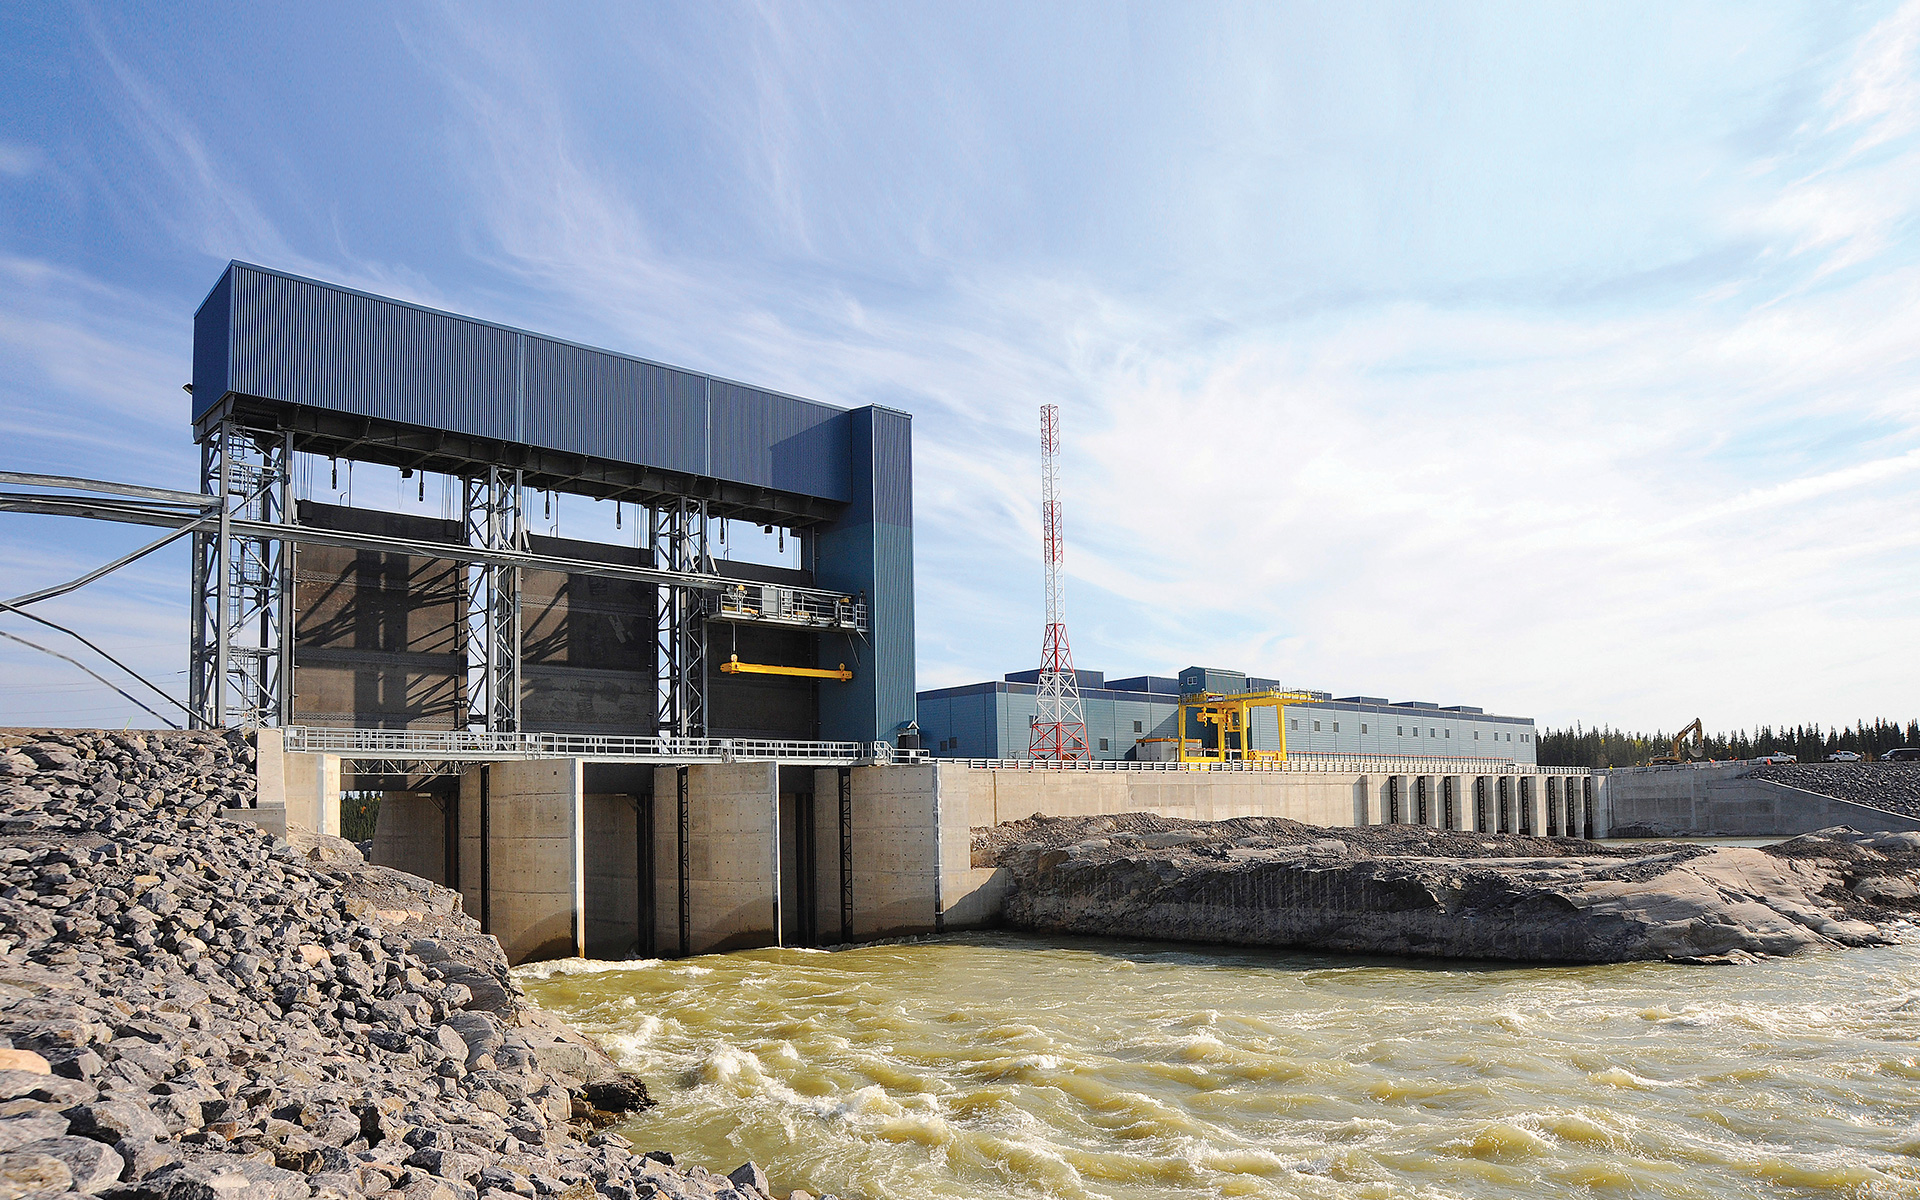 Wuskwatim Generating Station